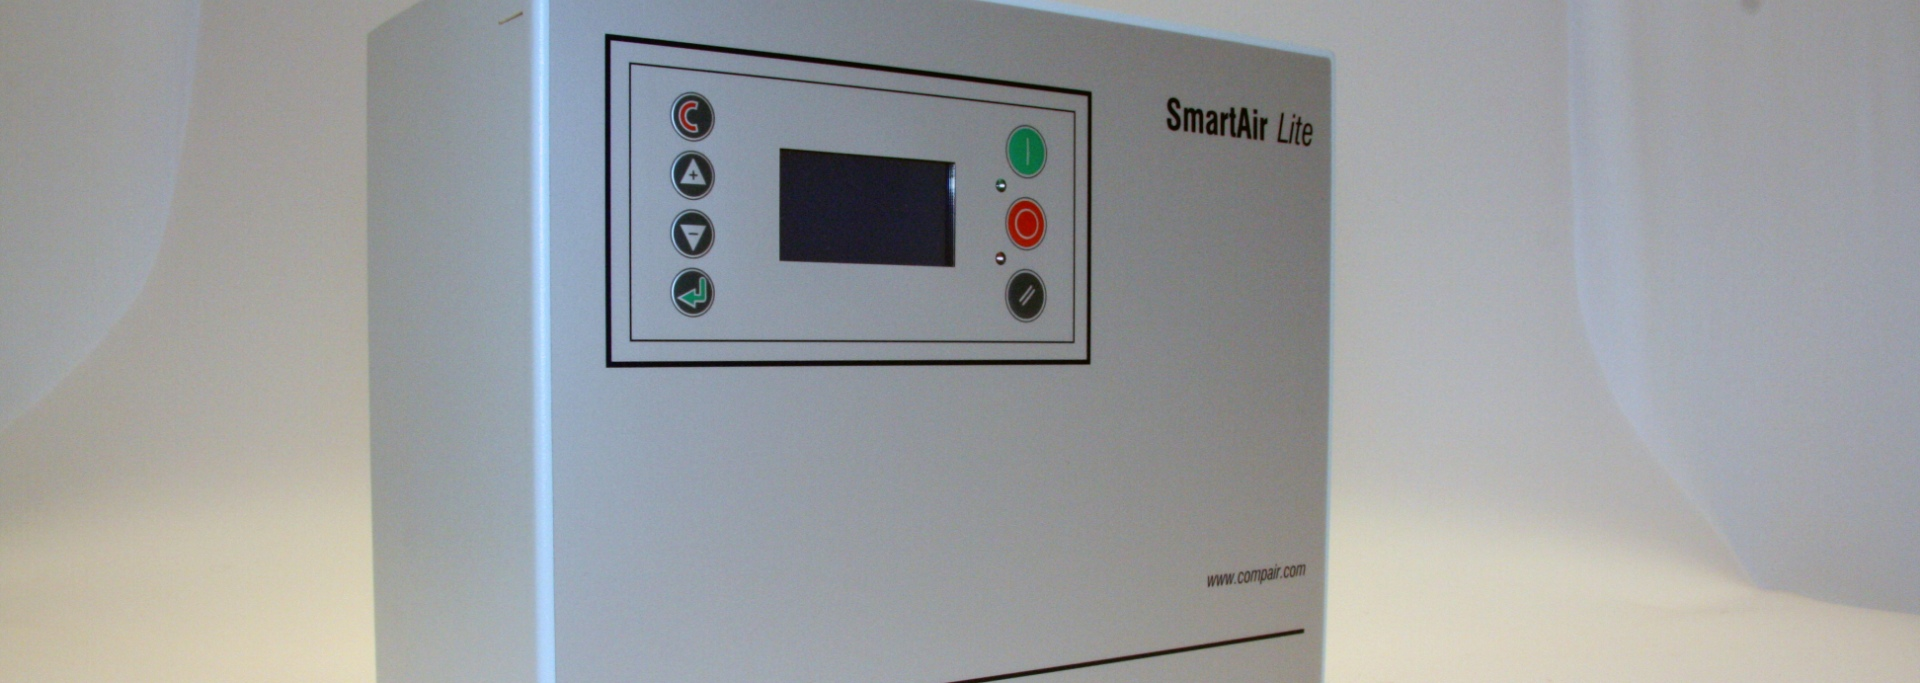 Compair SmartAir